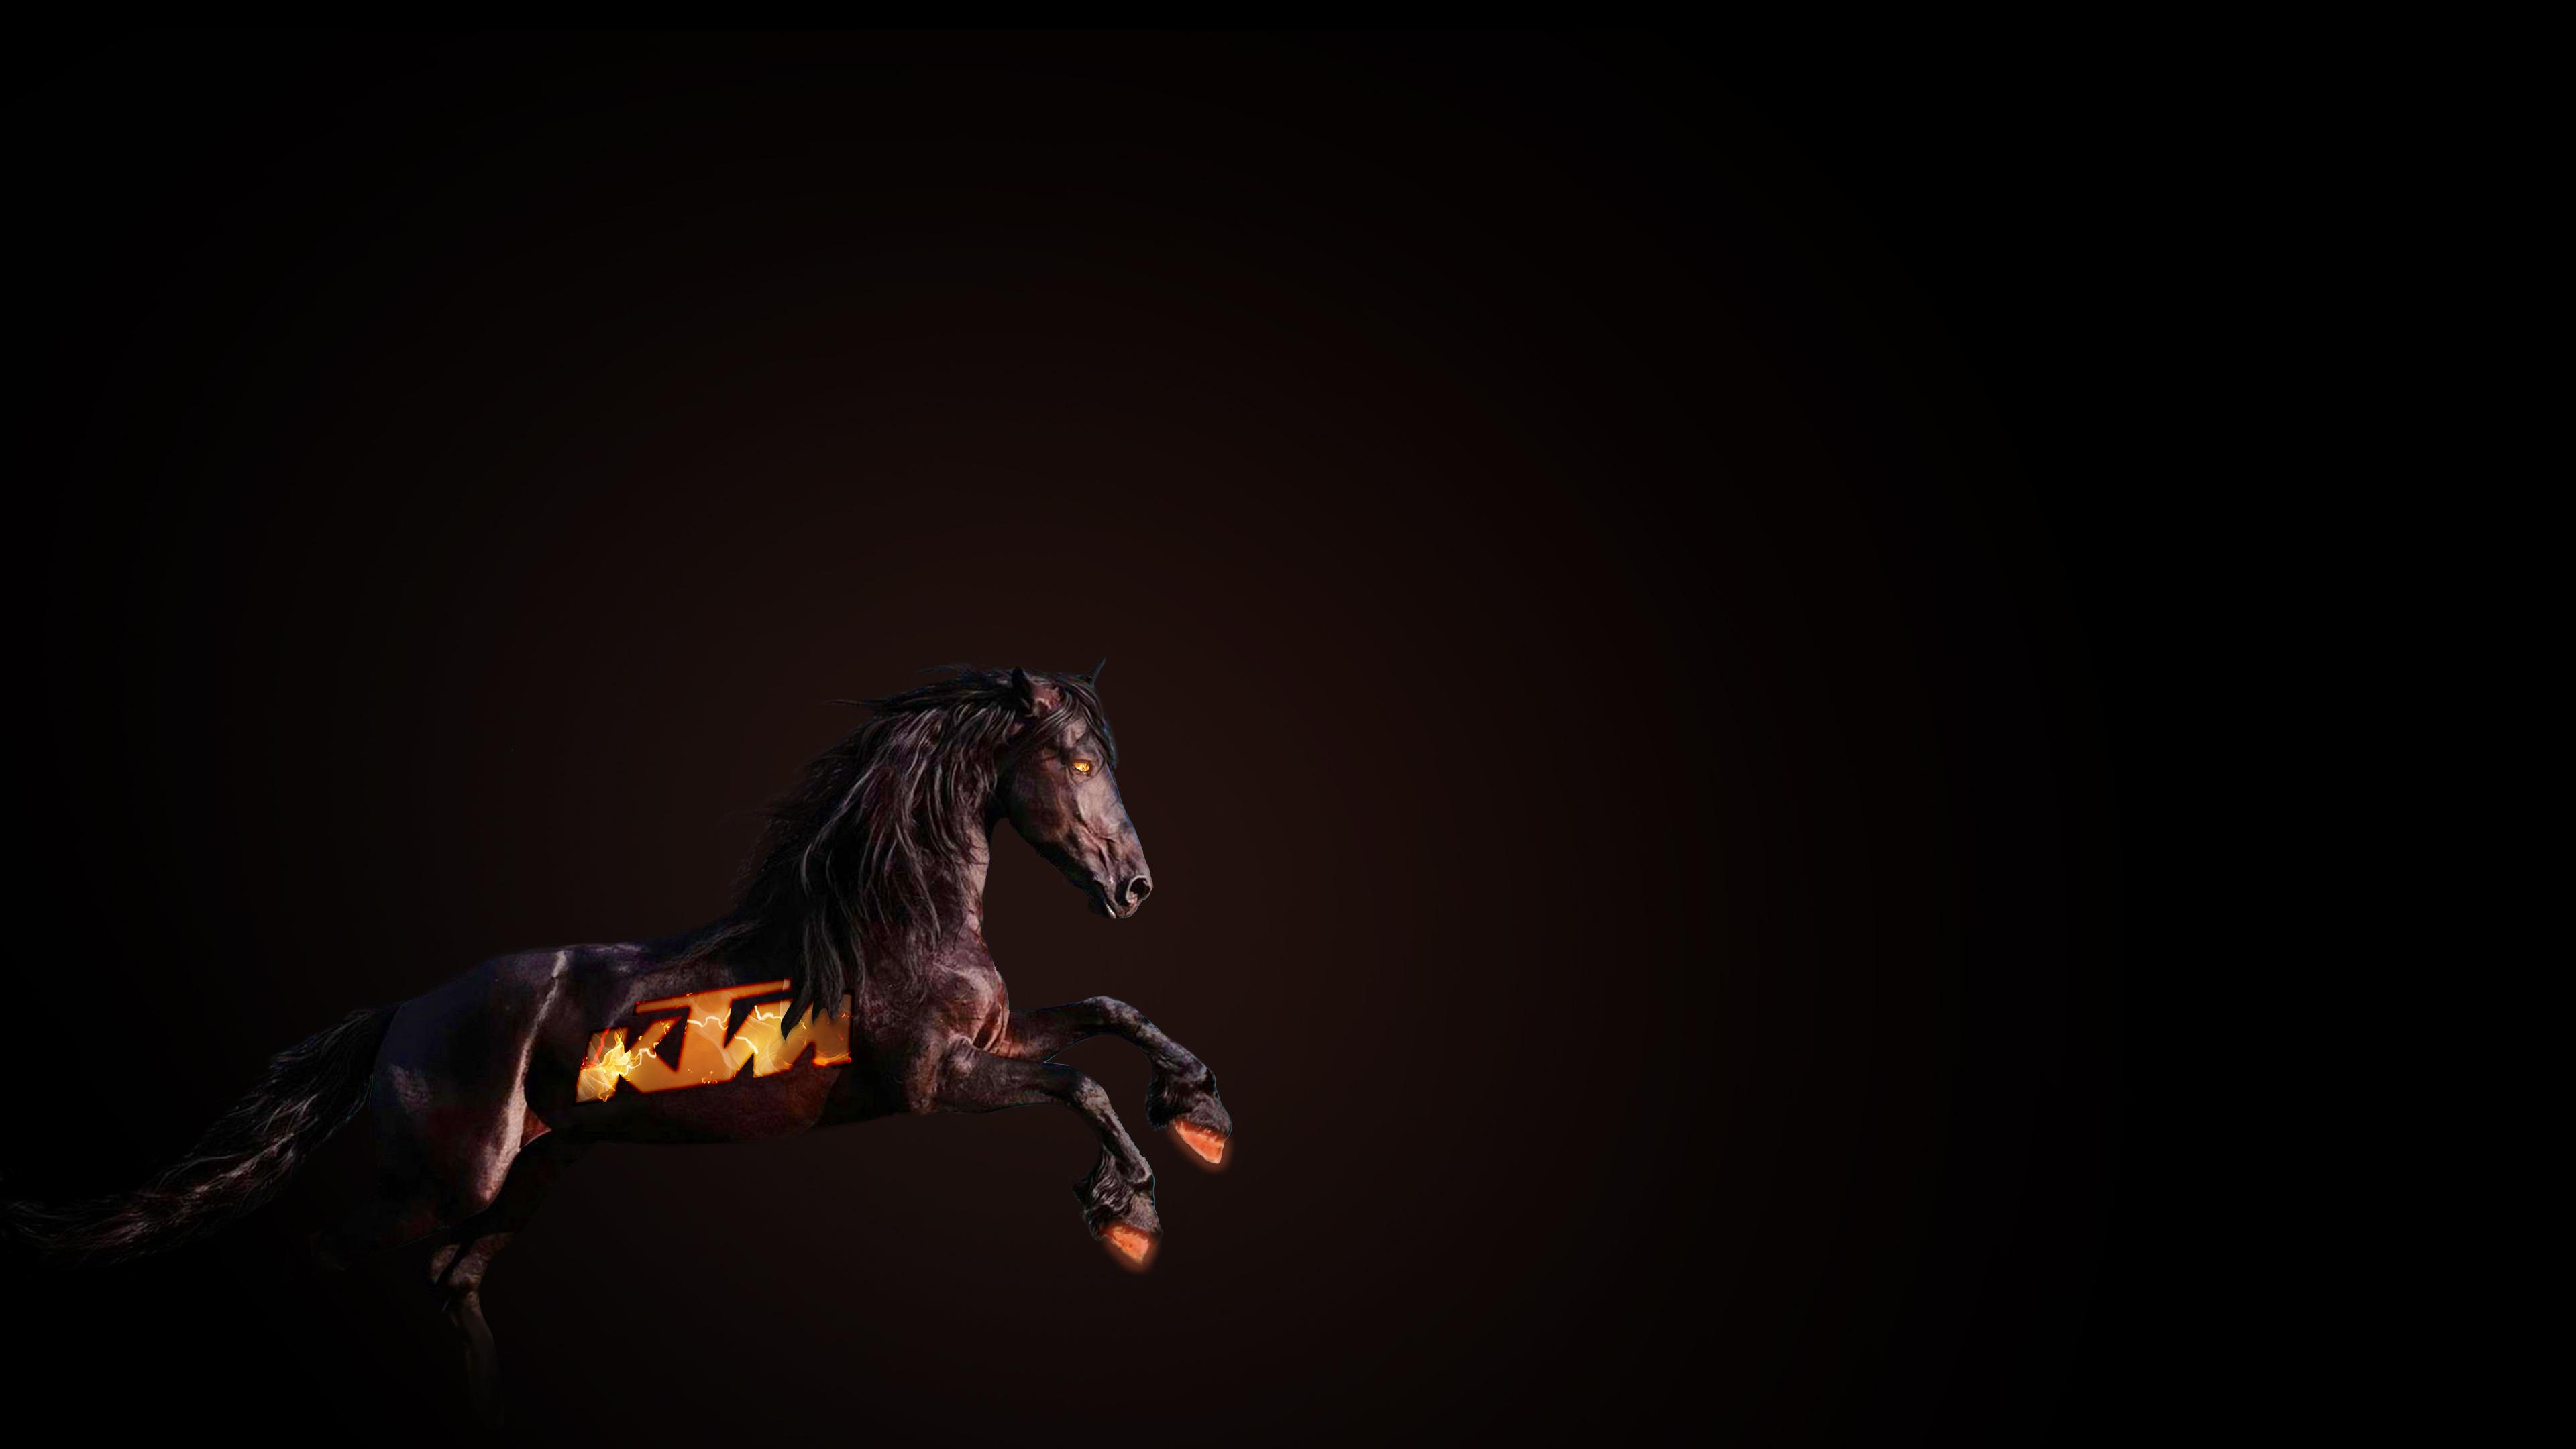 Ktm Horse